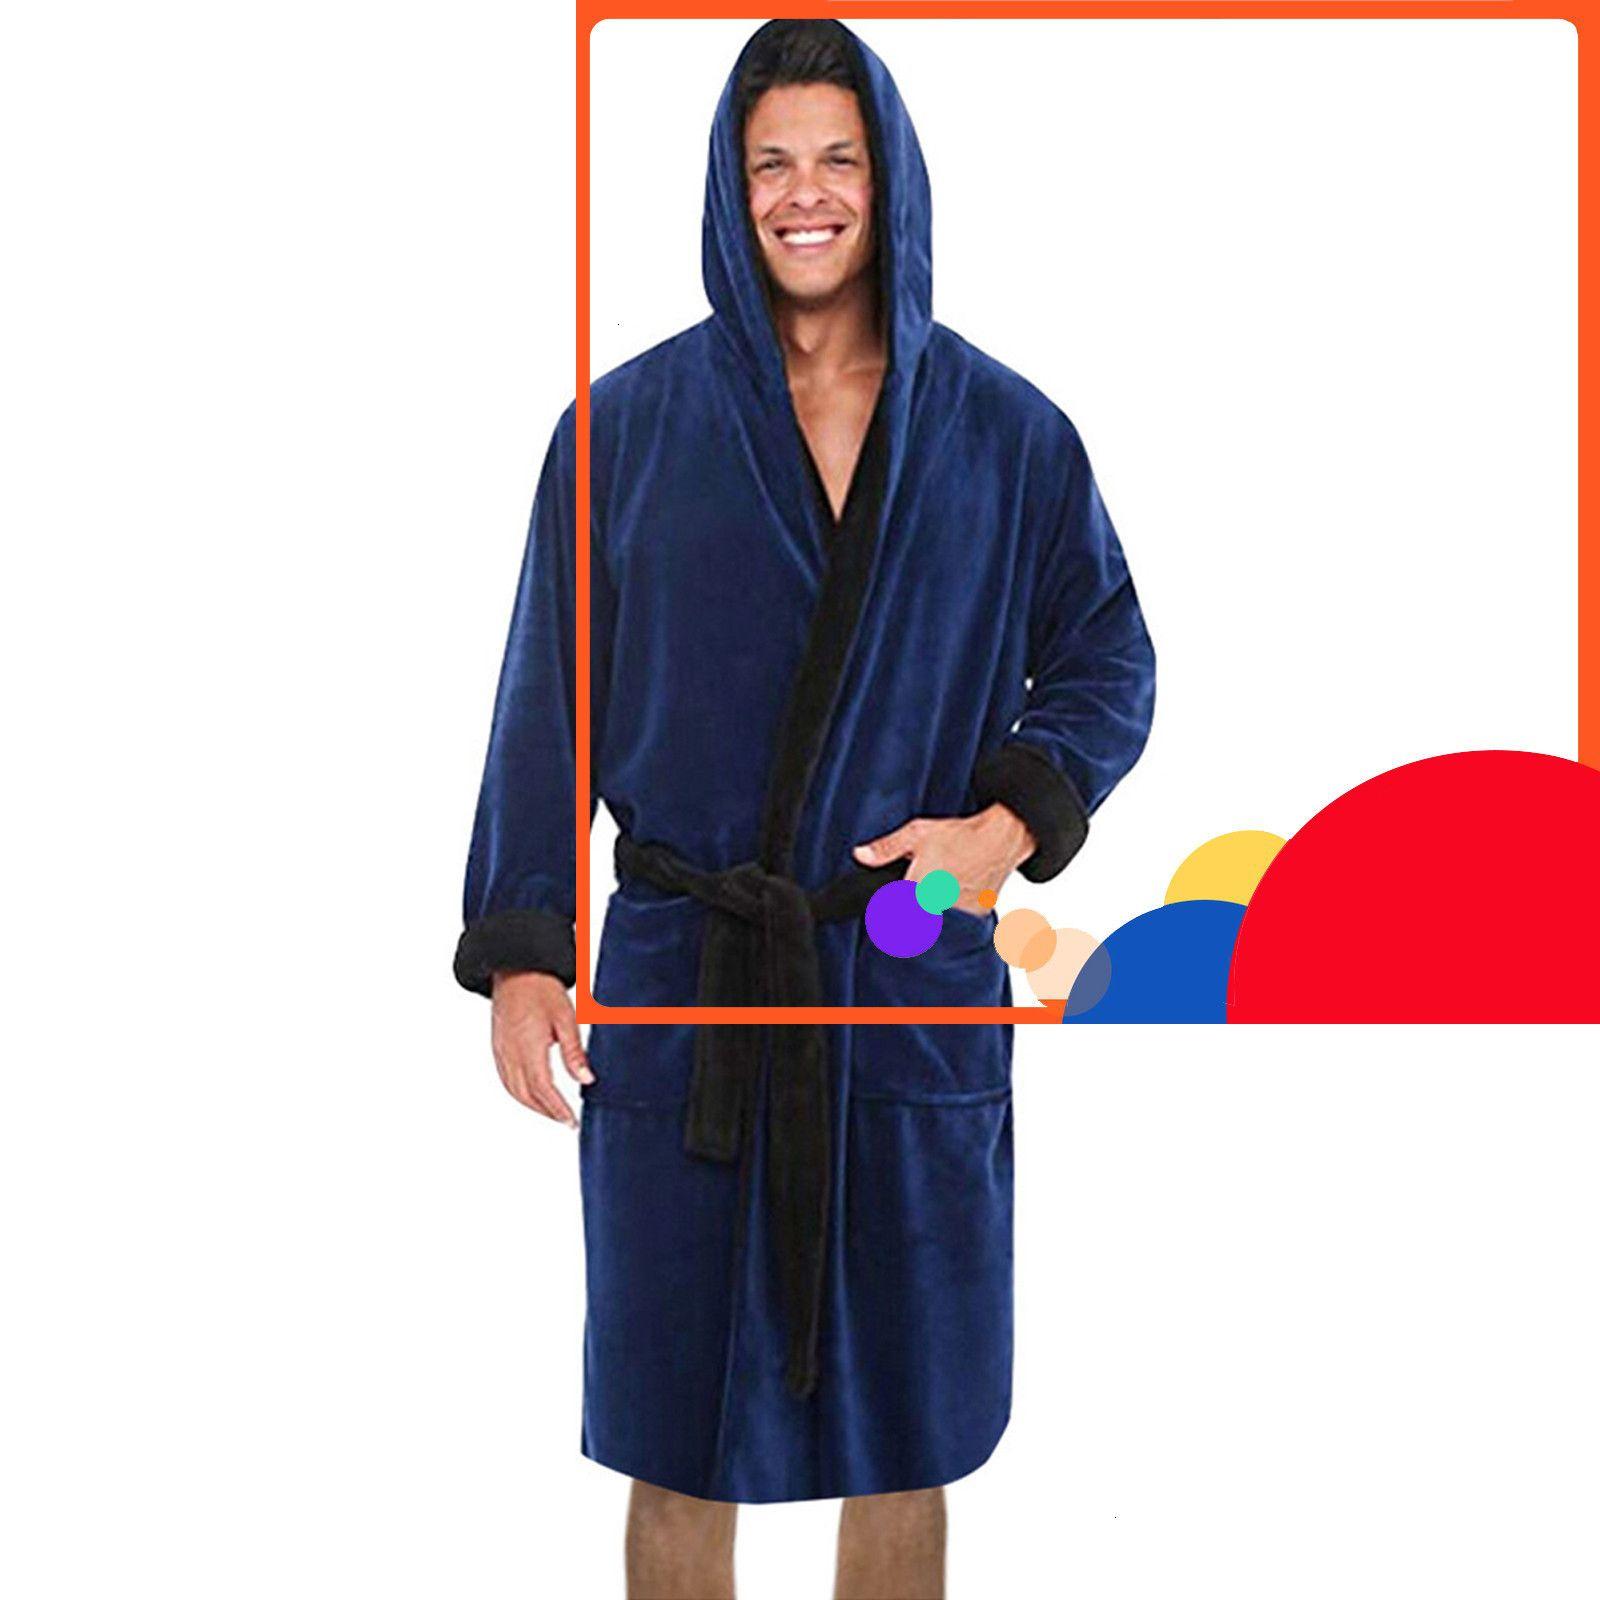 # B04 hombres invierno extendido pluche chal ropa de hogar largo mouwen bata abrigo badjas peignoir homme gewaad